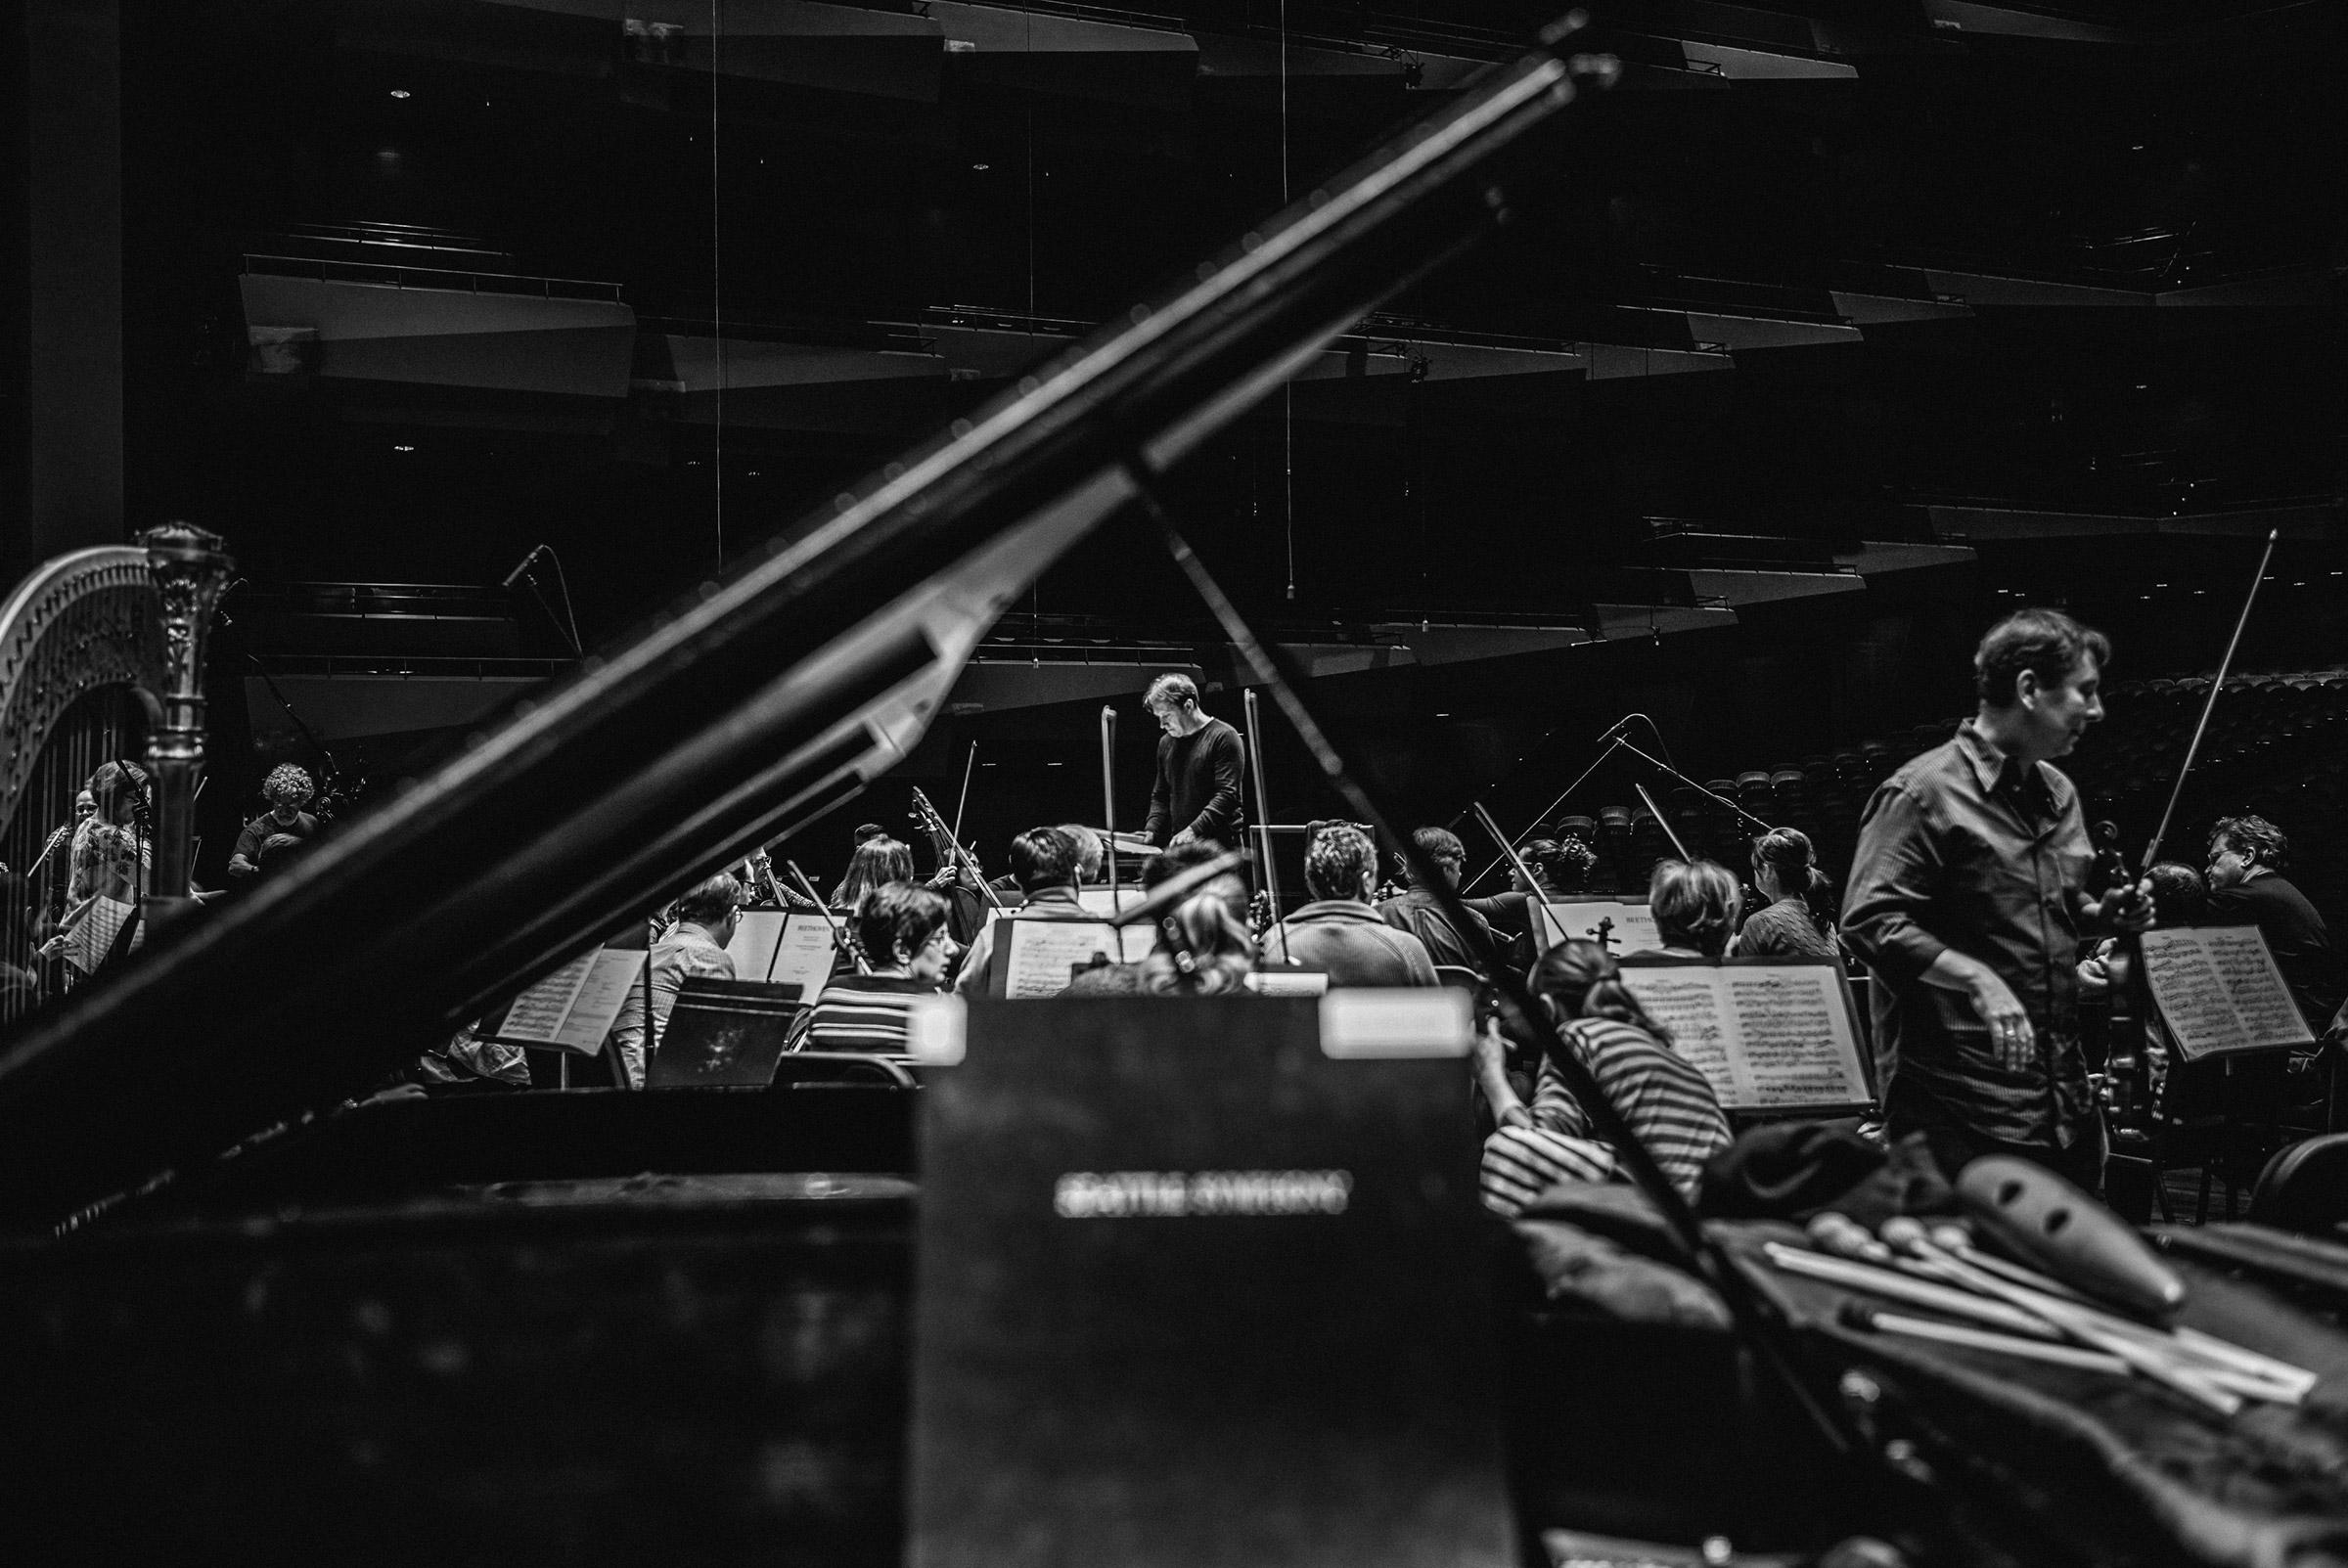 seattle-symphony-brandon-patoc-rehearsal-02.jpg